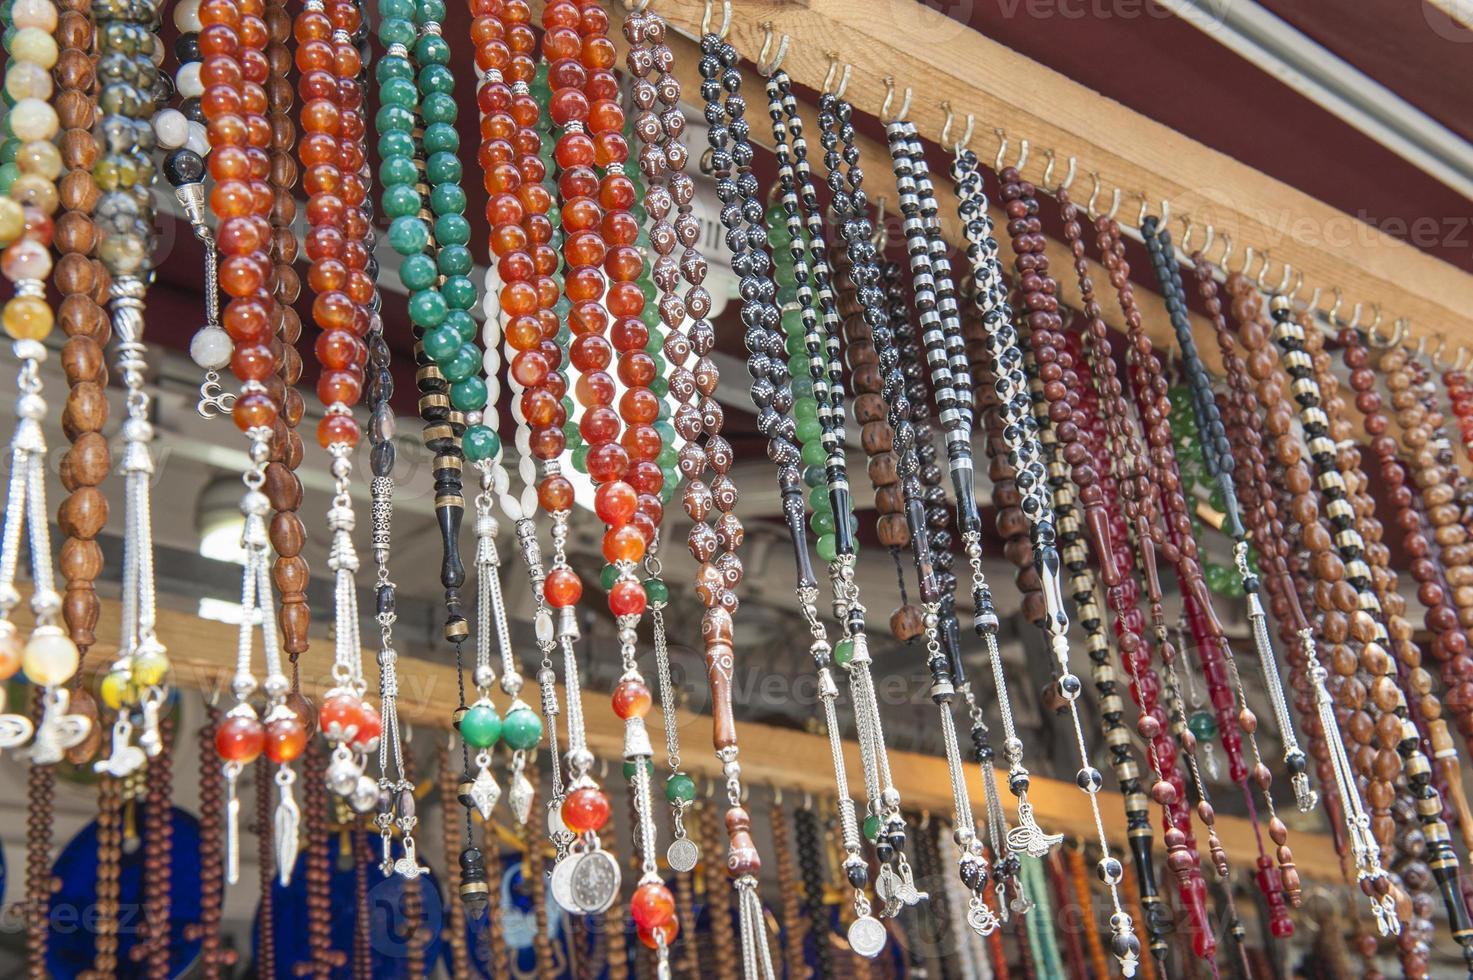 Ornate jewelry hanging at market stall photo